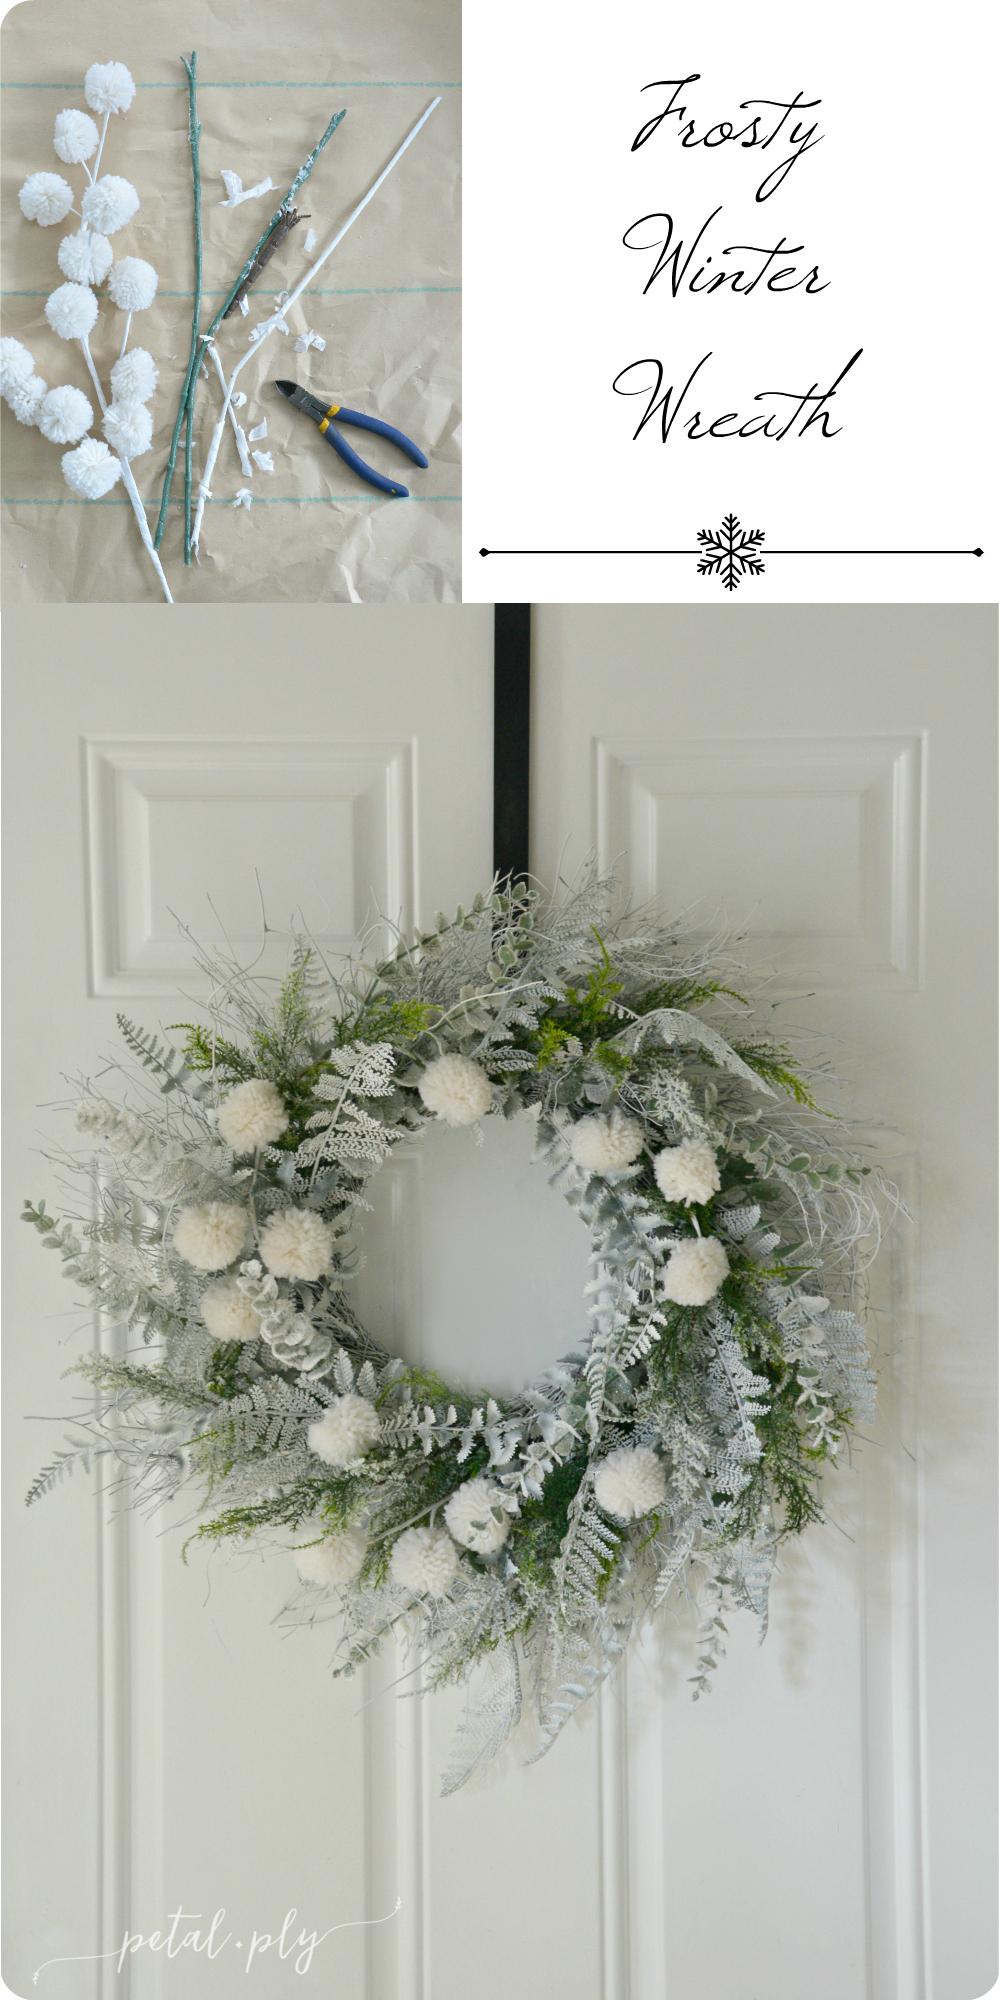 frosty-winter-wreath-pin-image